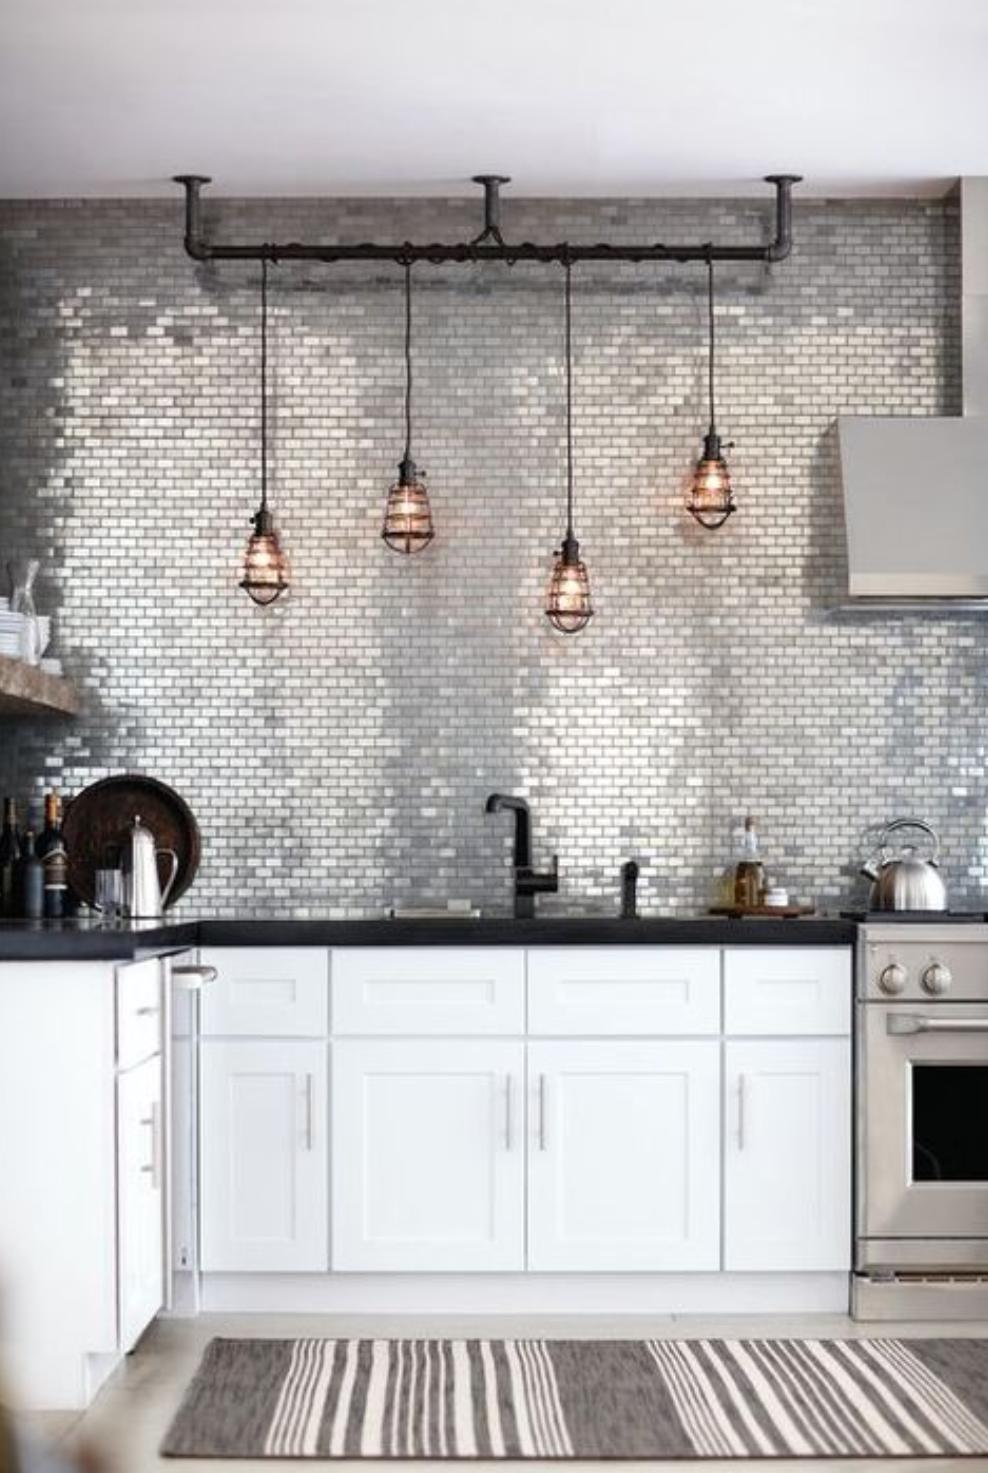 21 Small Kitchen Design Ideas Photo Gallery | White shaker cabinets ...